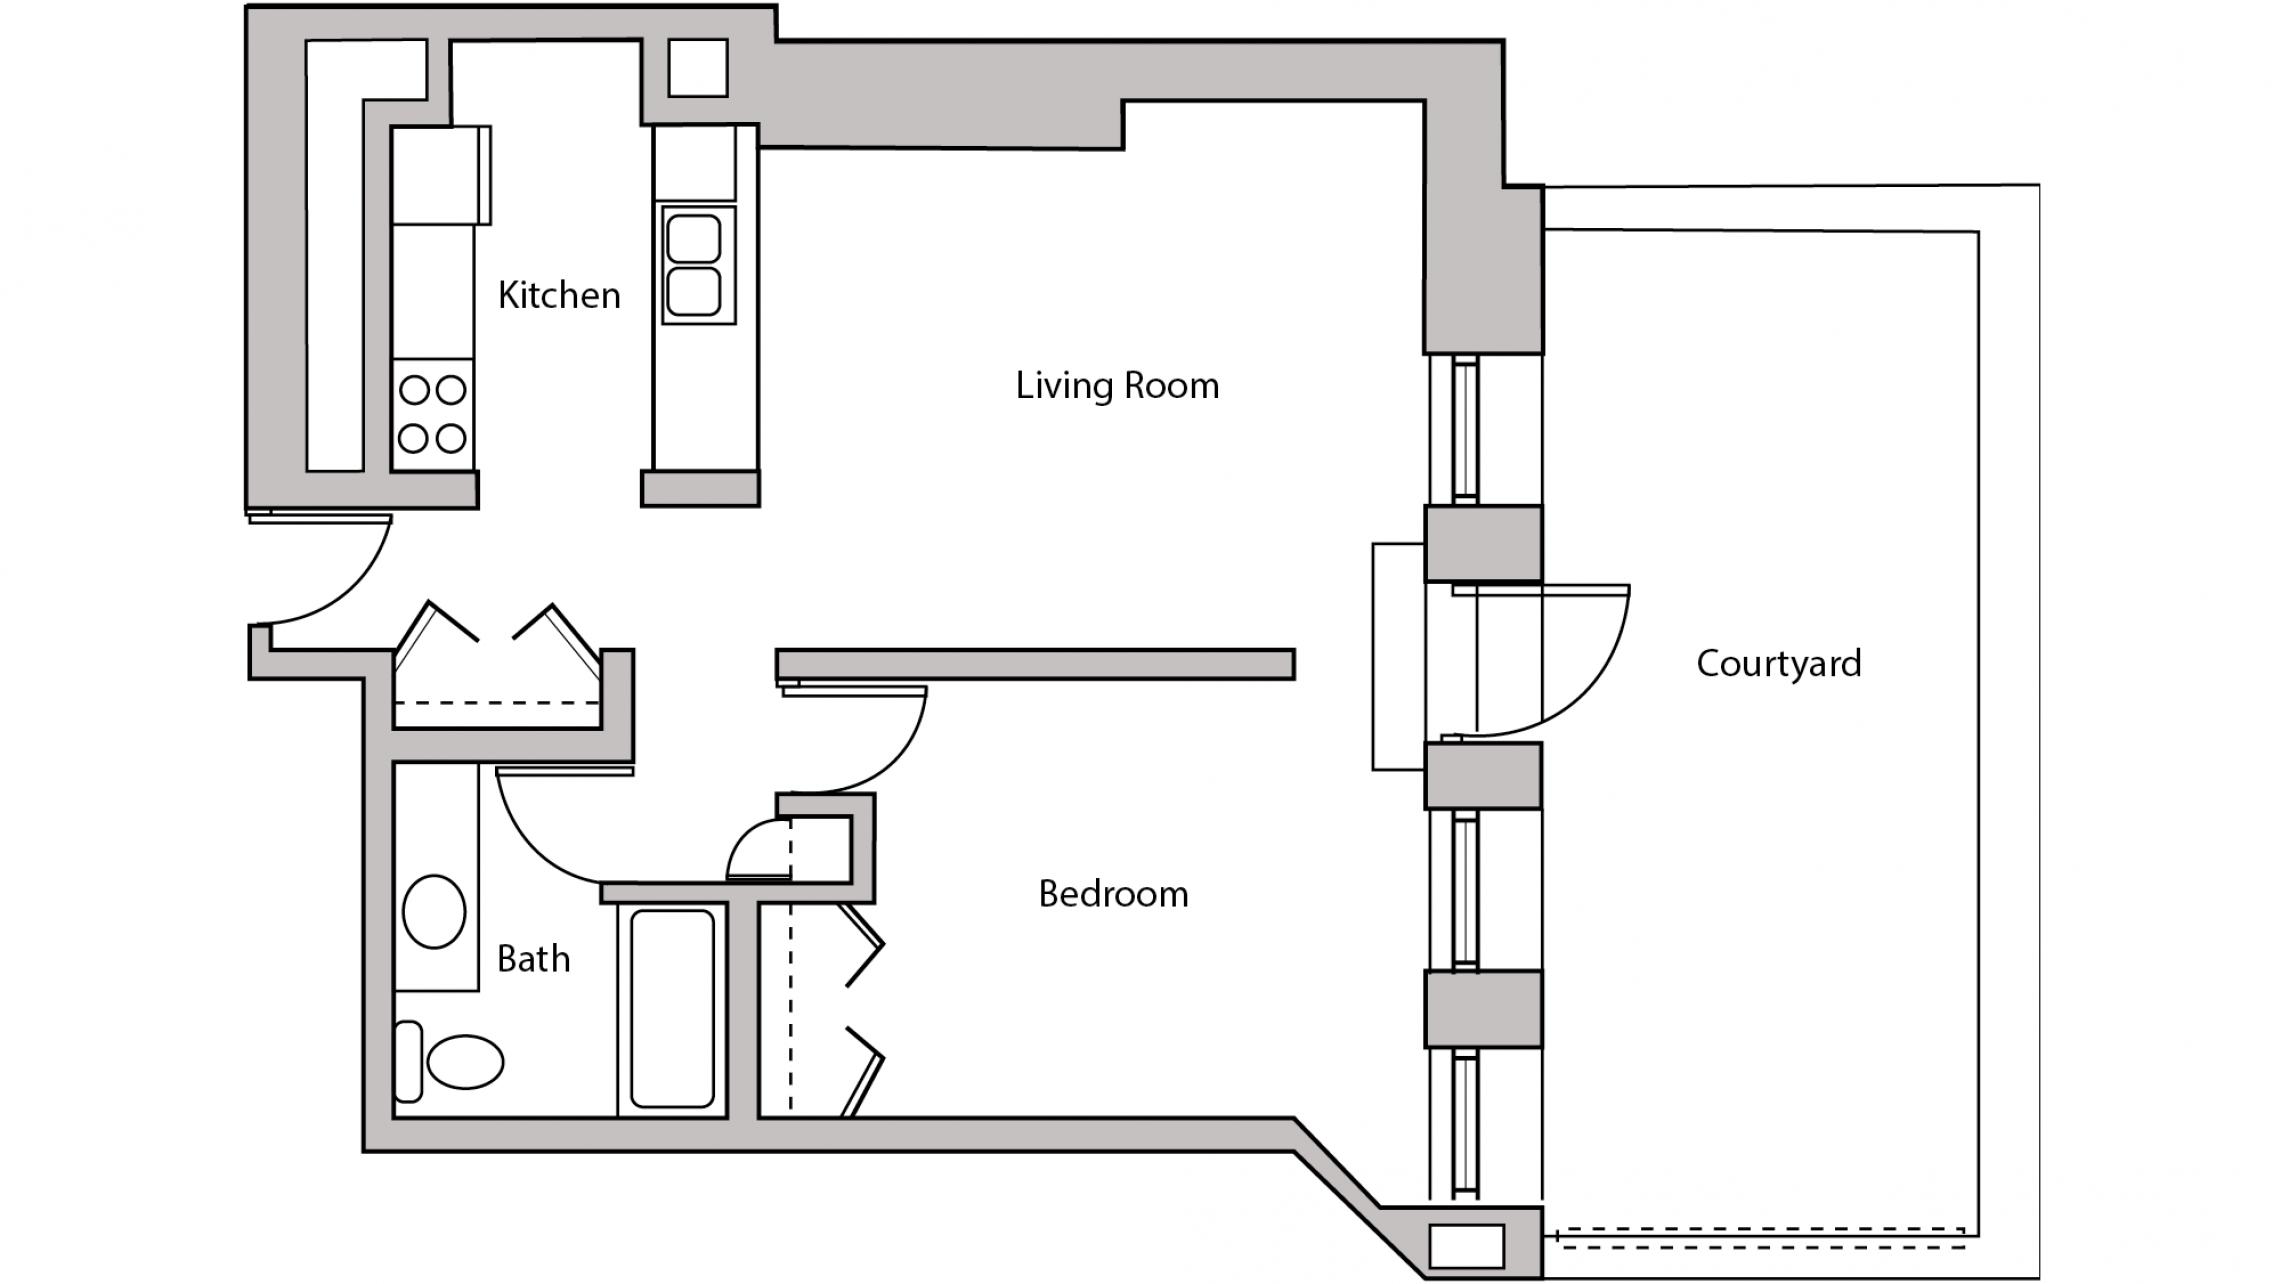 ULI Lincoln School 207 - One Bedroom, One Bathroom